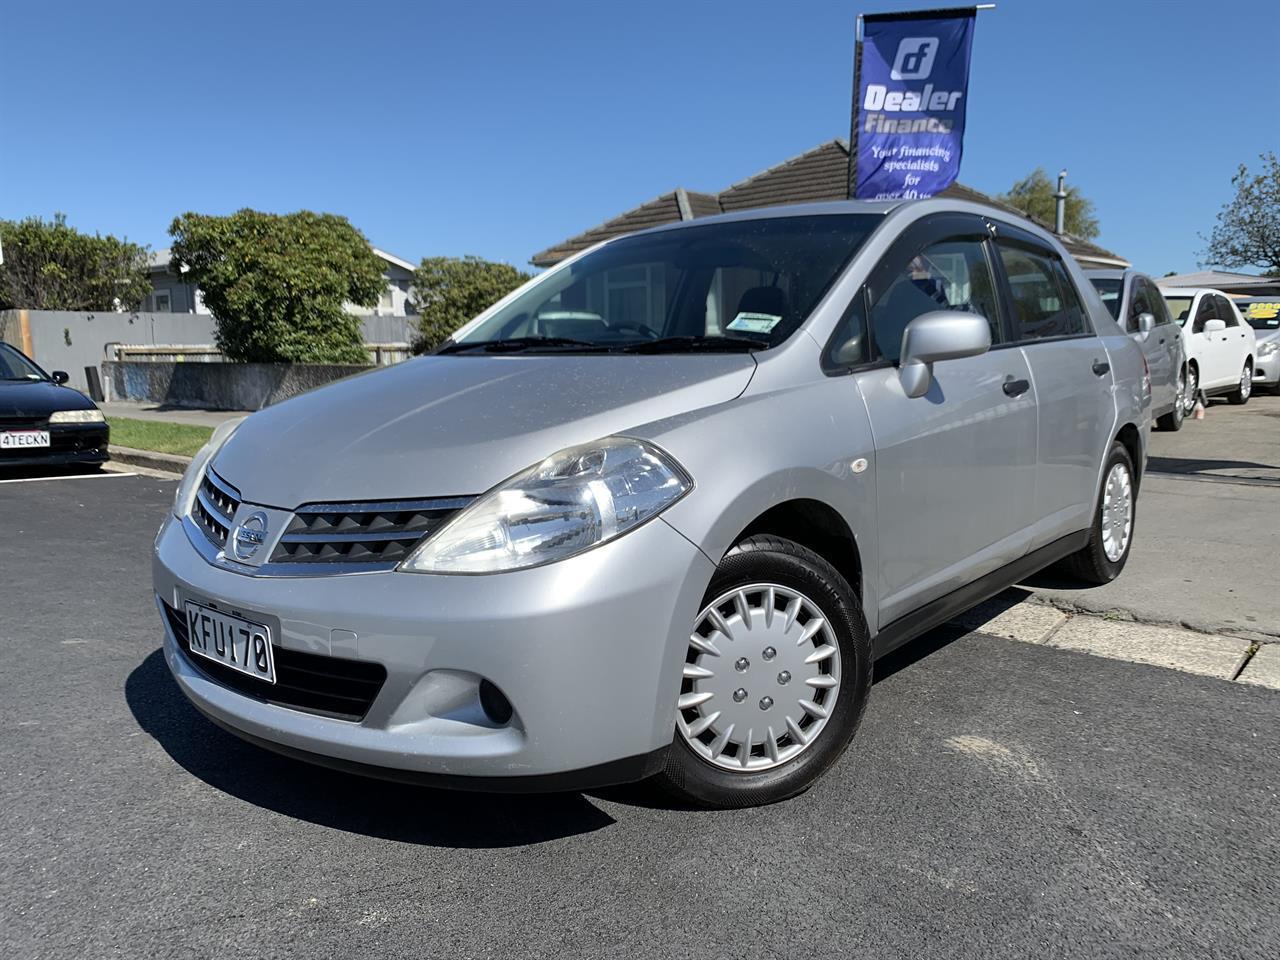 image-1, 2011 Nissan Tiida LATIO SILVER SALOON at Christchurch